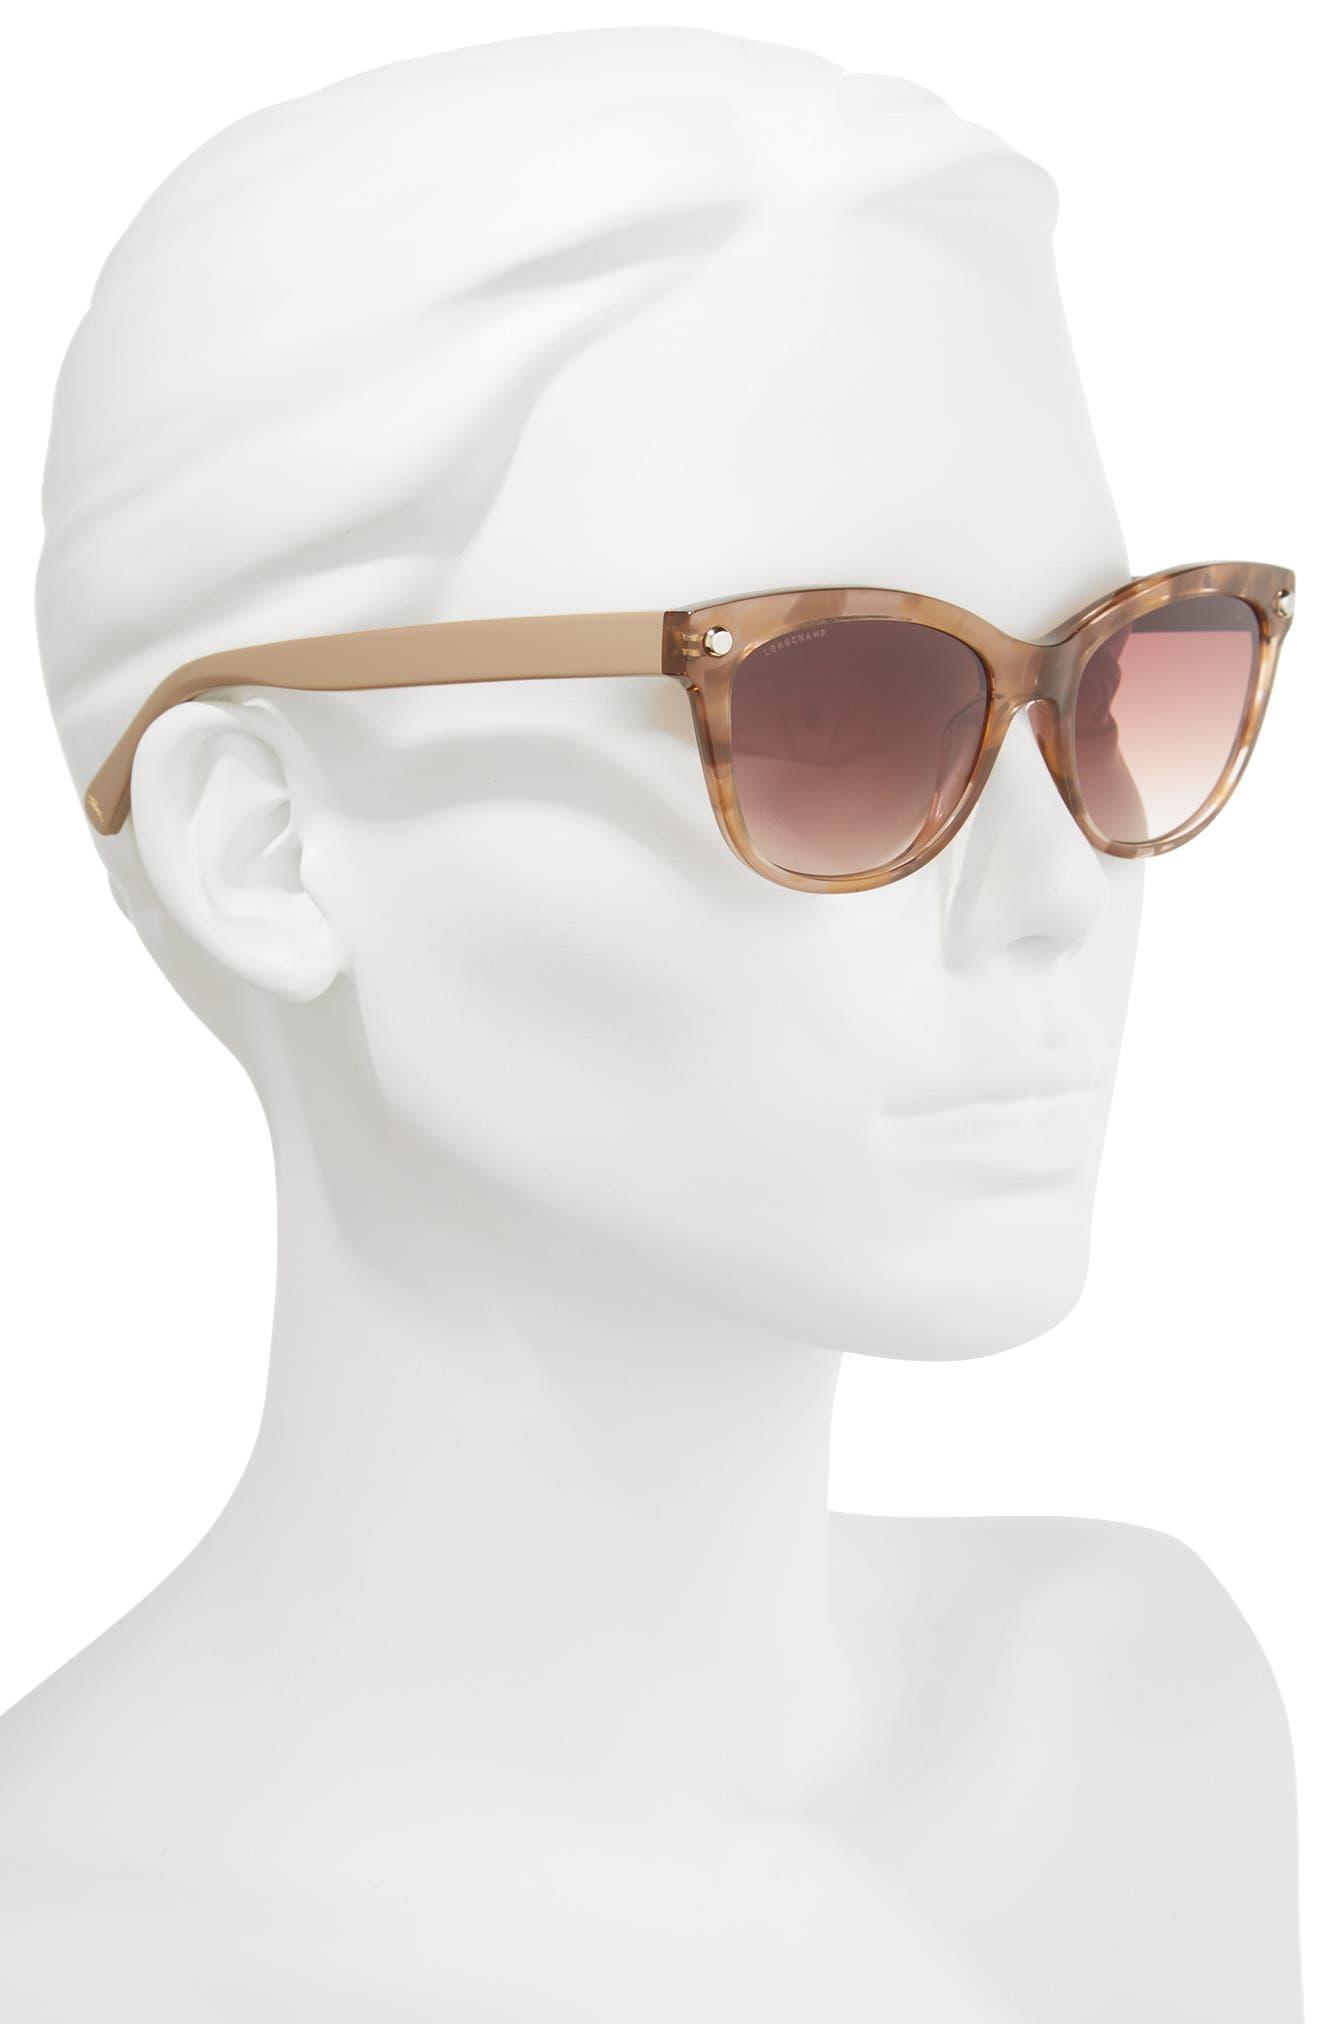 83c79c5e809d Beige Sunglasses for Women